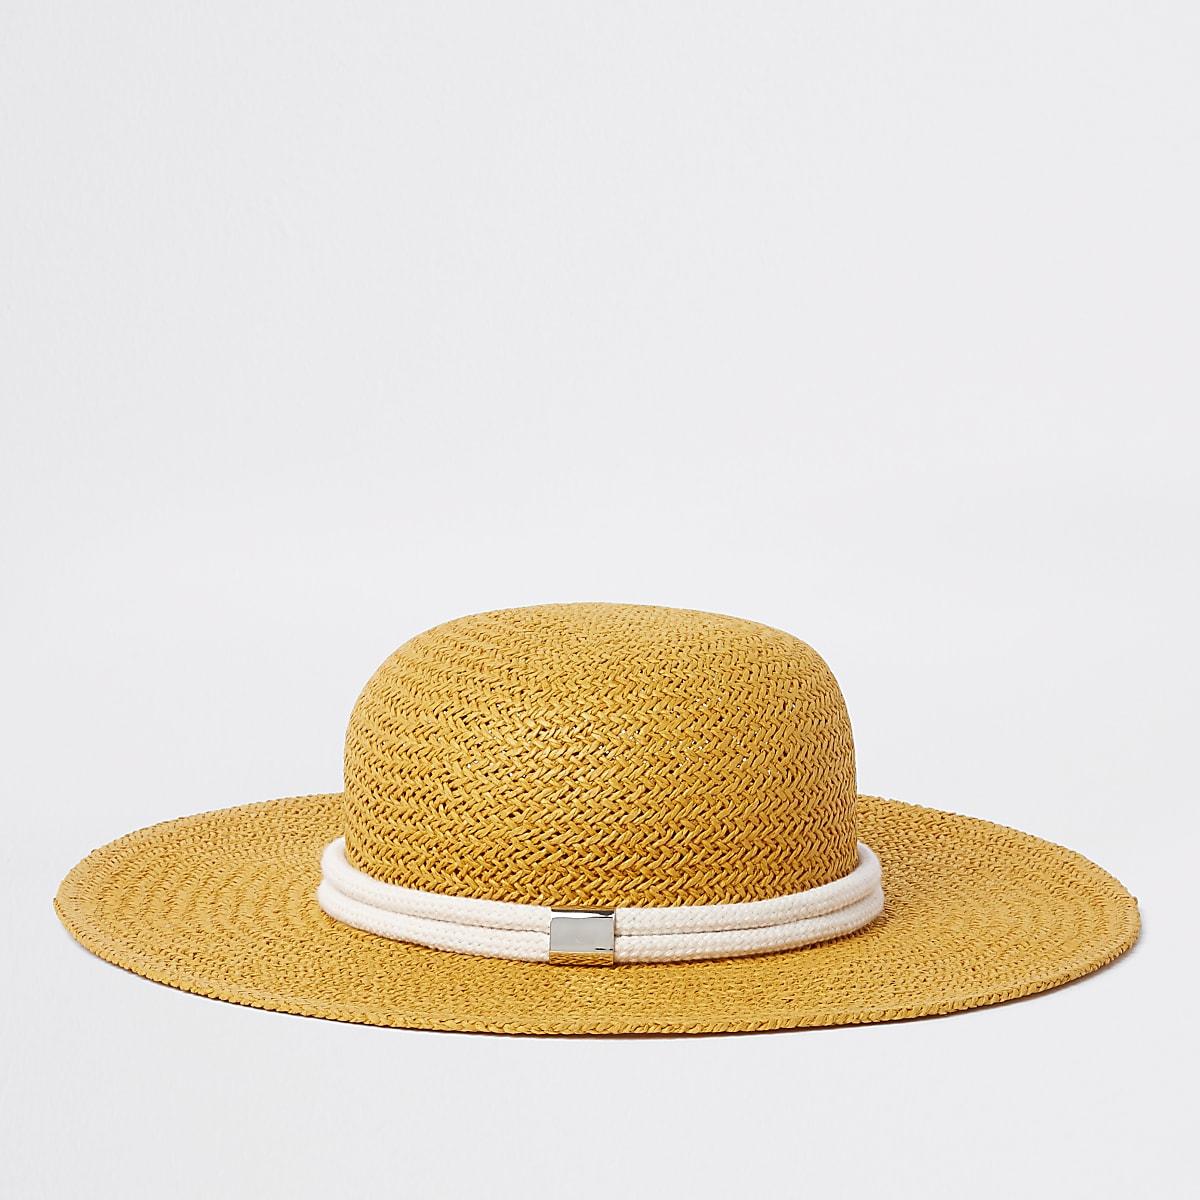 Yellow woven straw rope trim hat